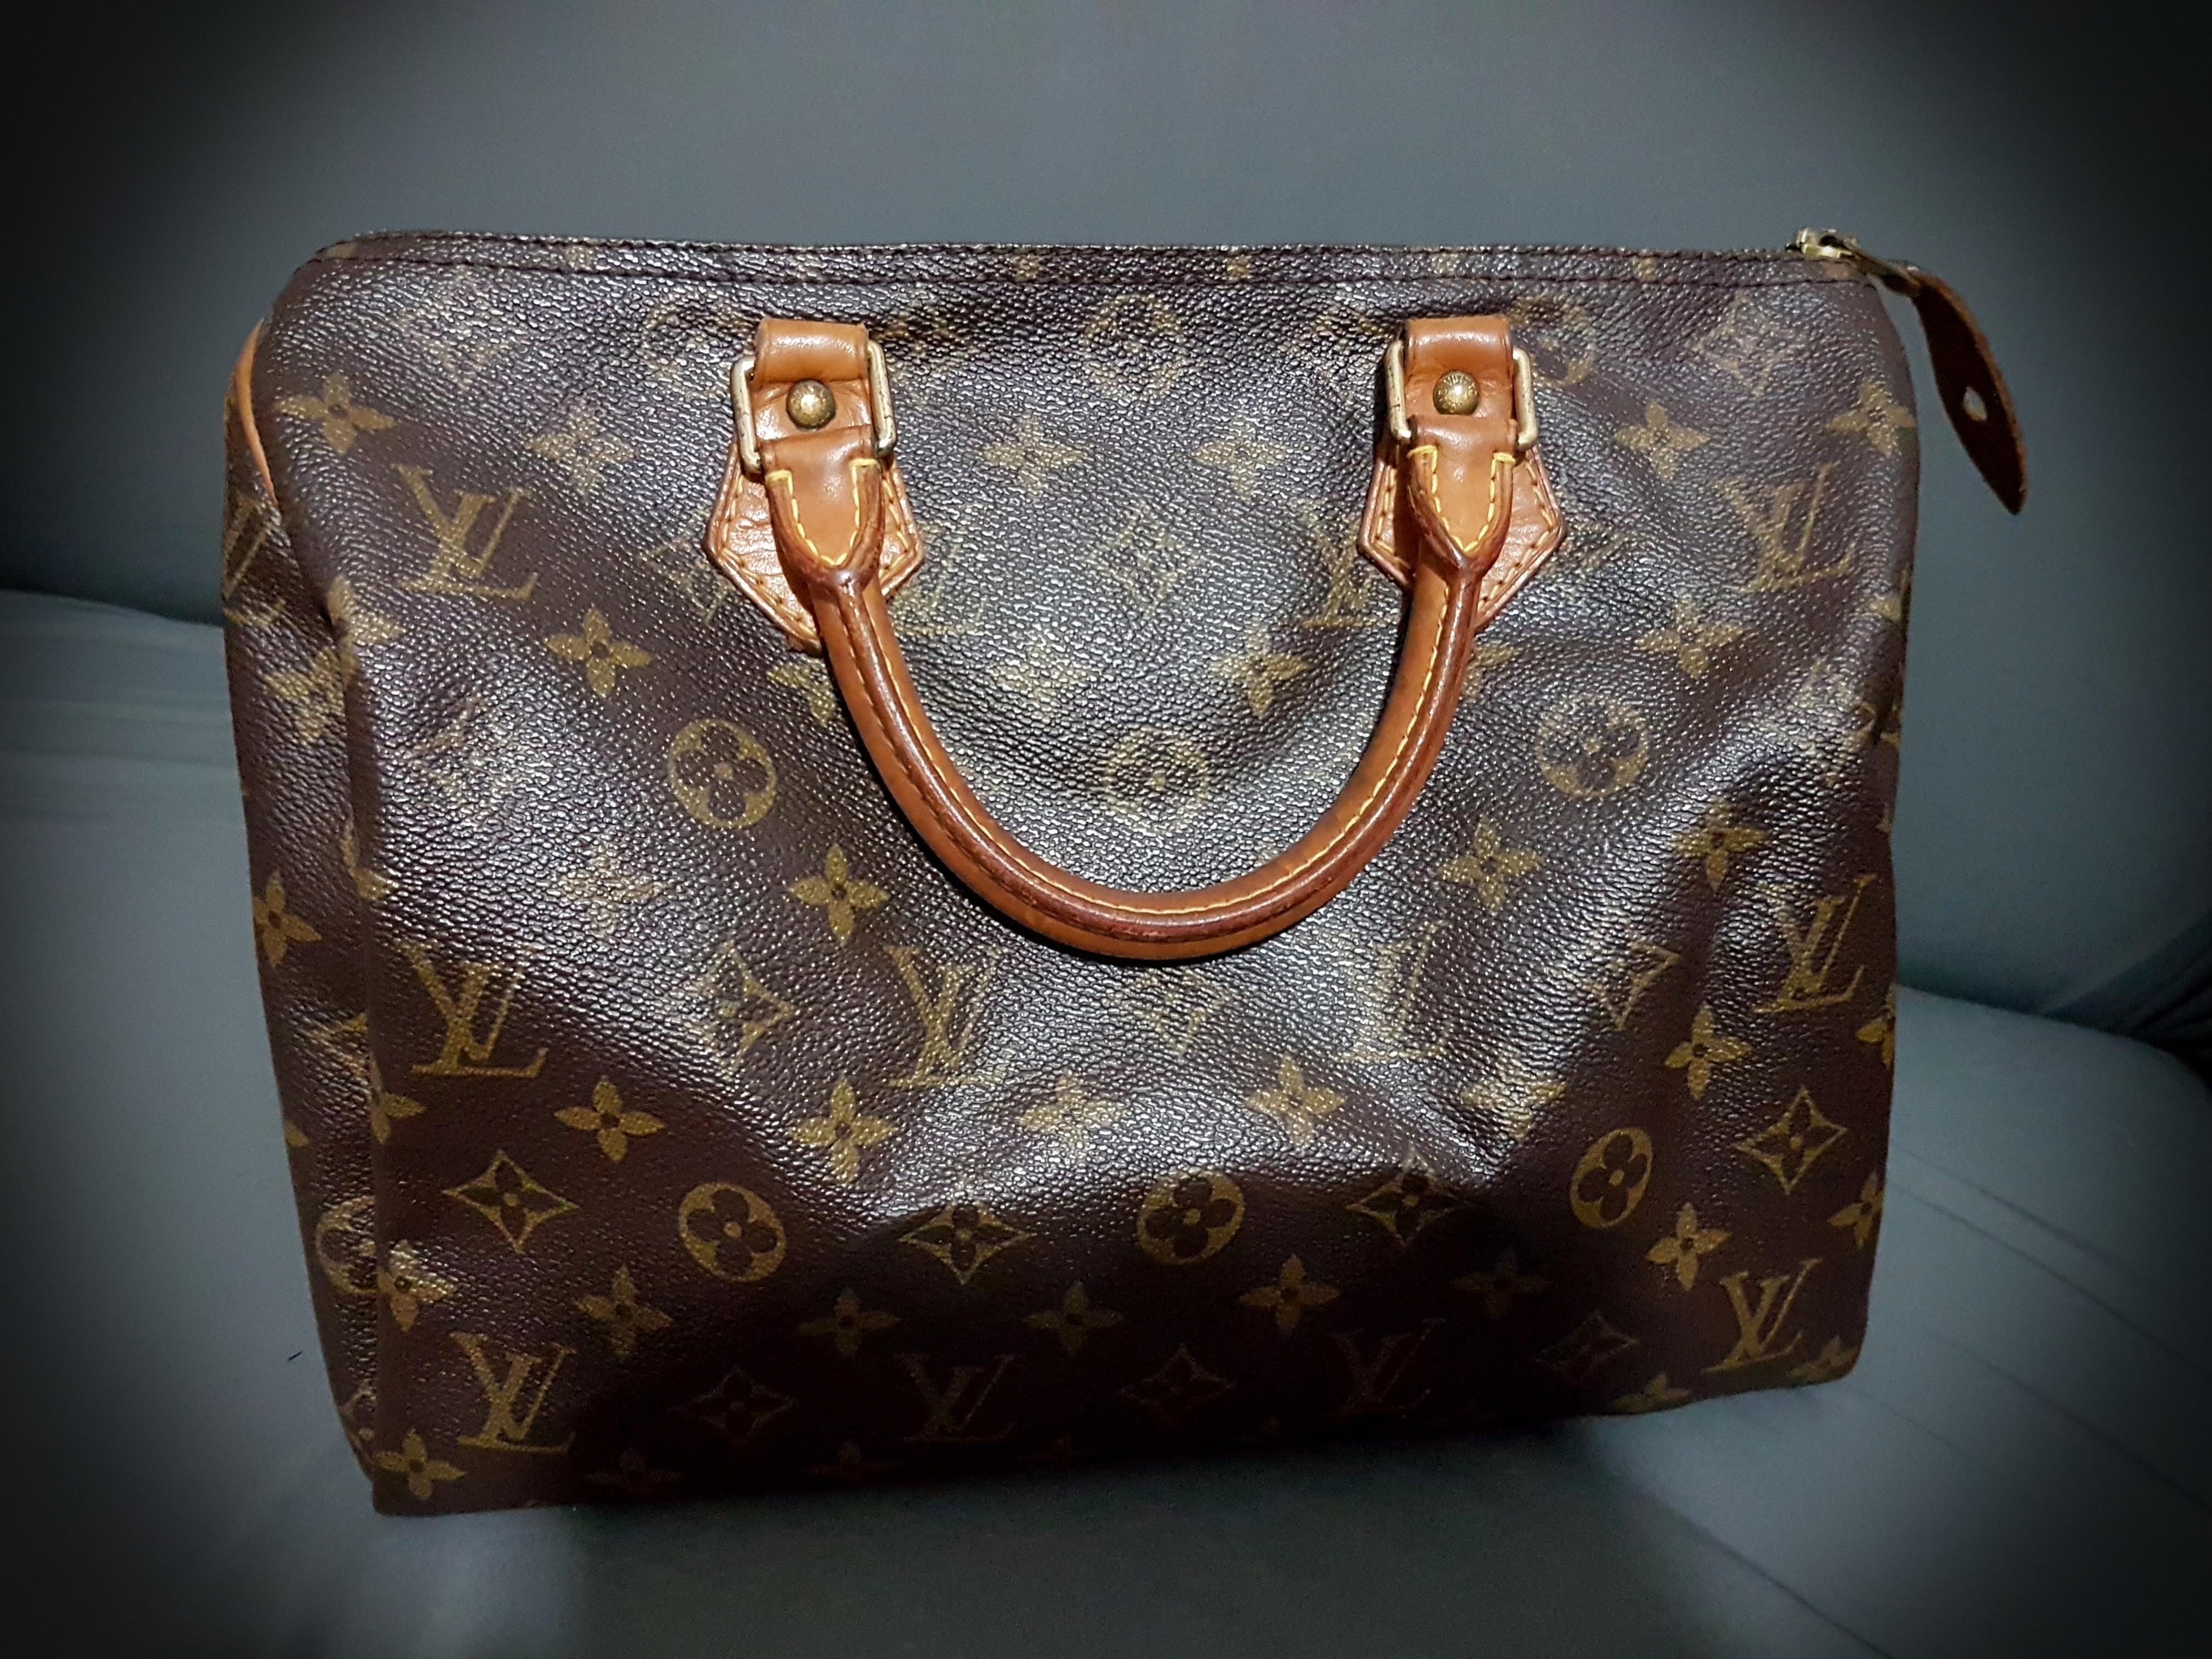 296cfc3c19c9 Authentic Louis Vuitton Speedy 30 Handbag